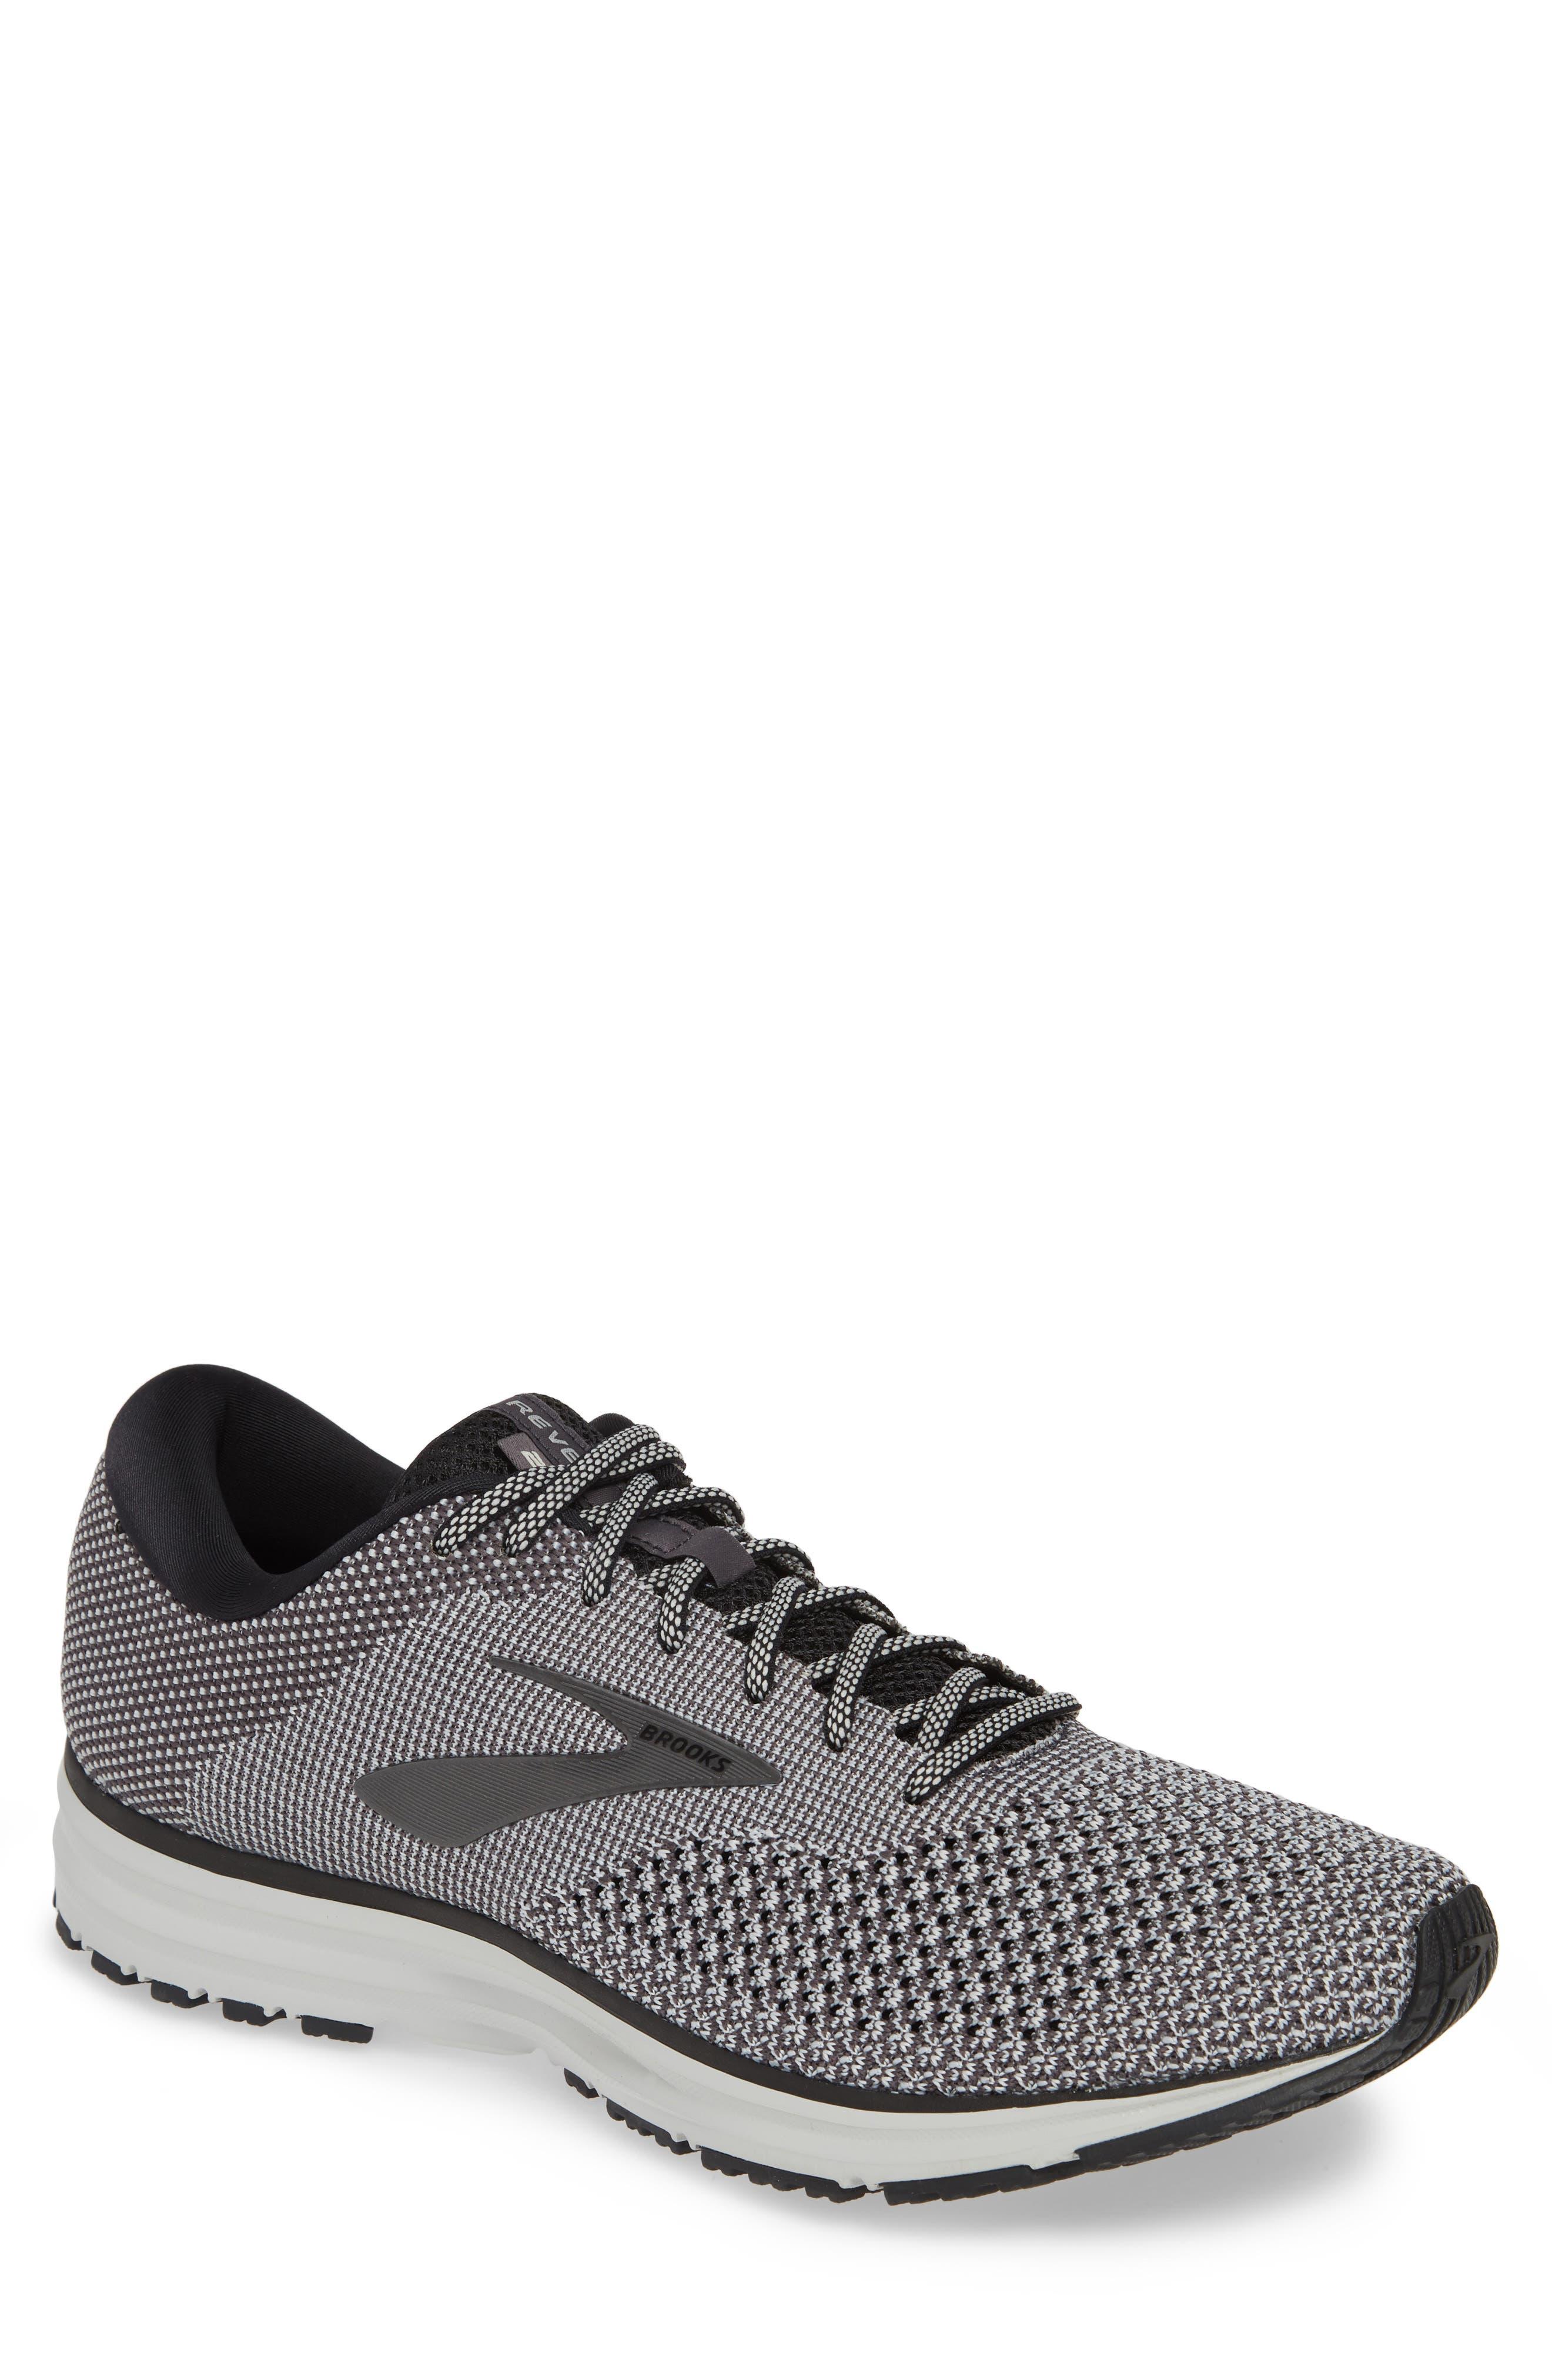 Brooks Revel 2 Running Shoe, Grey